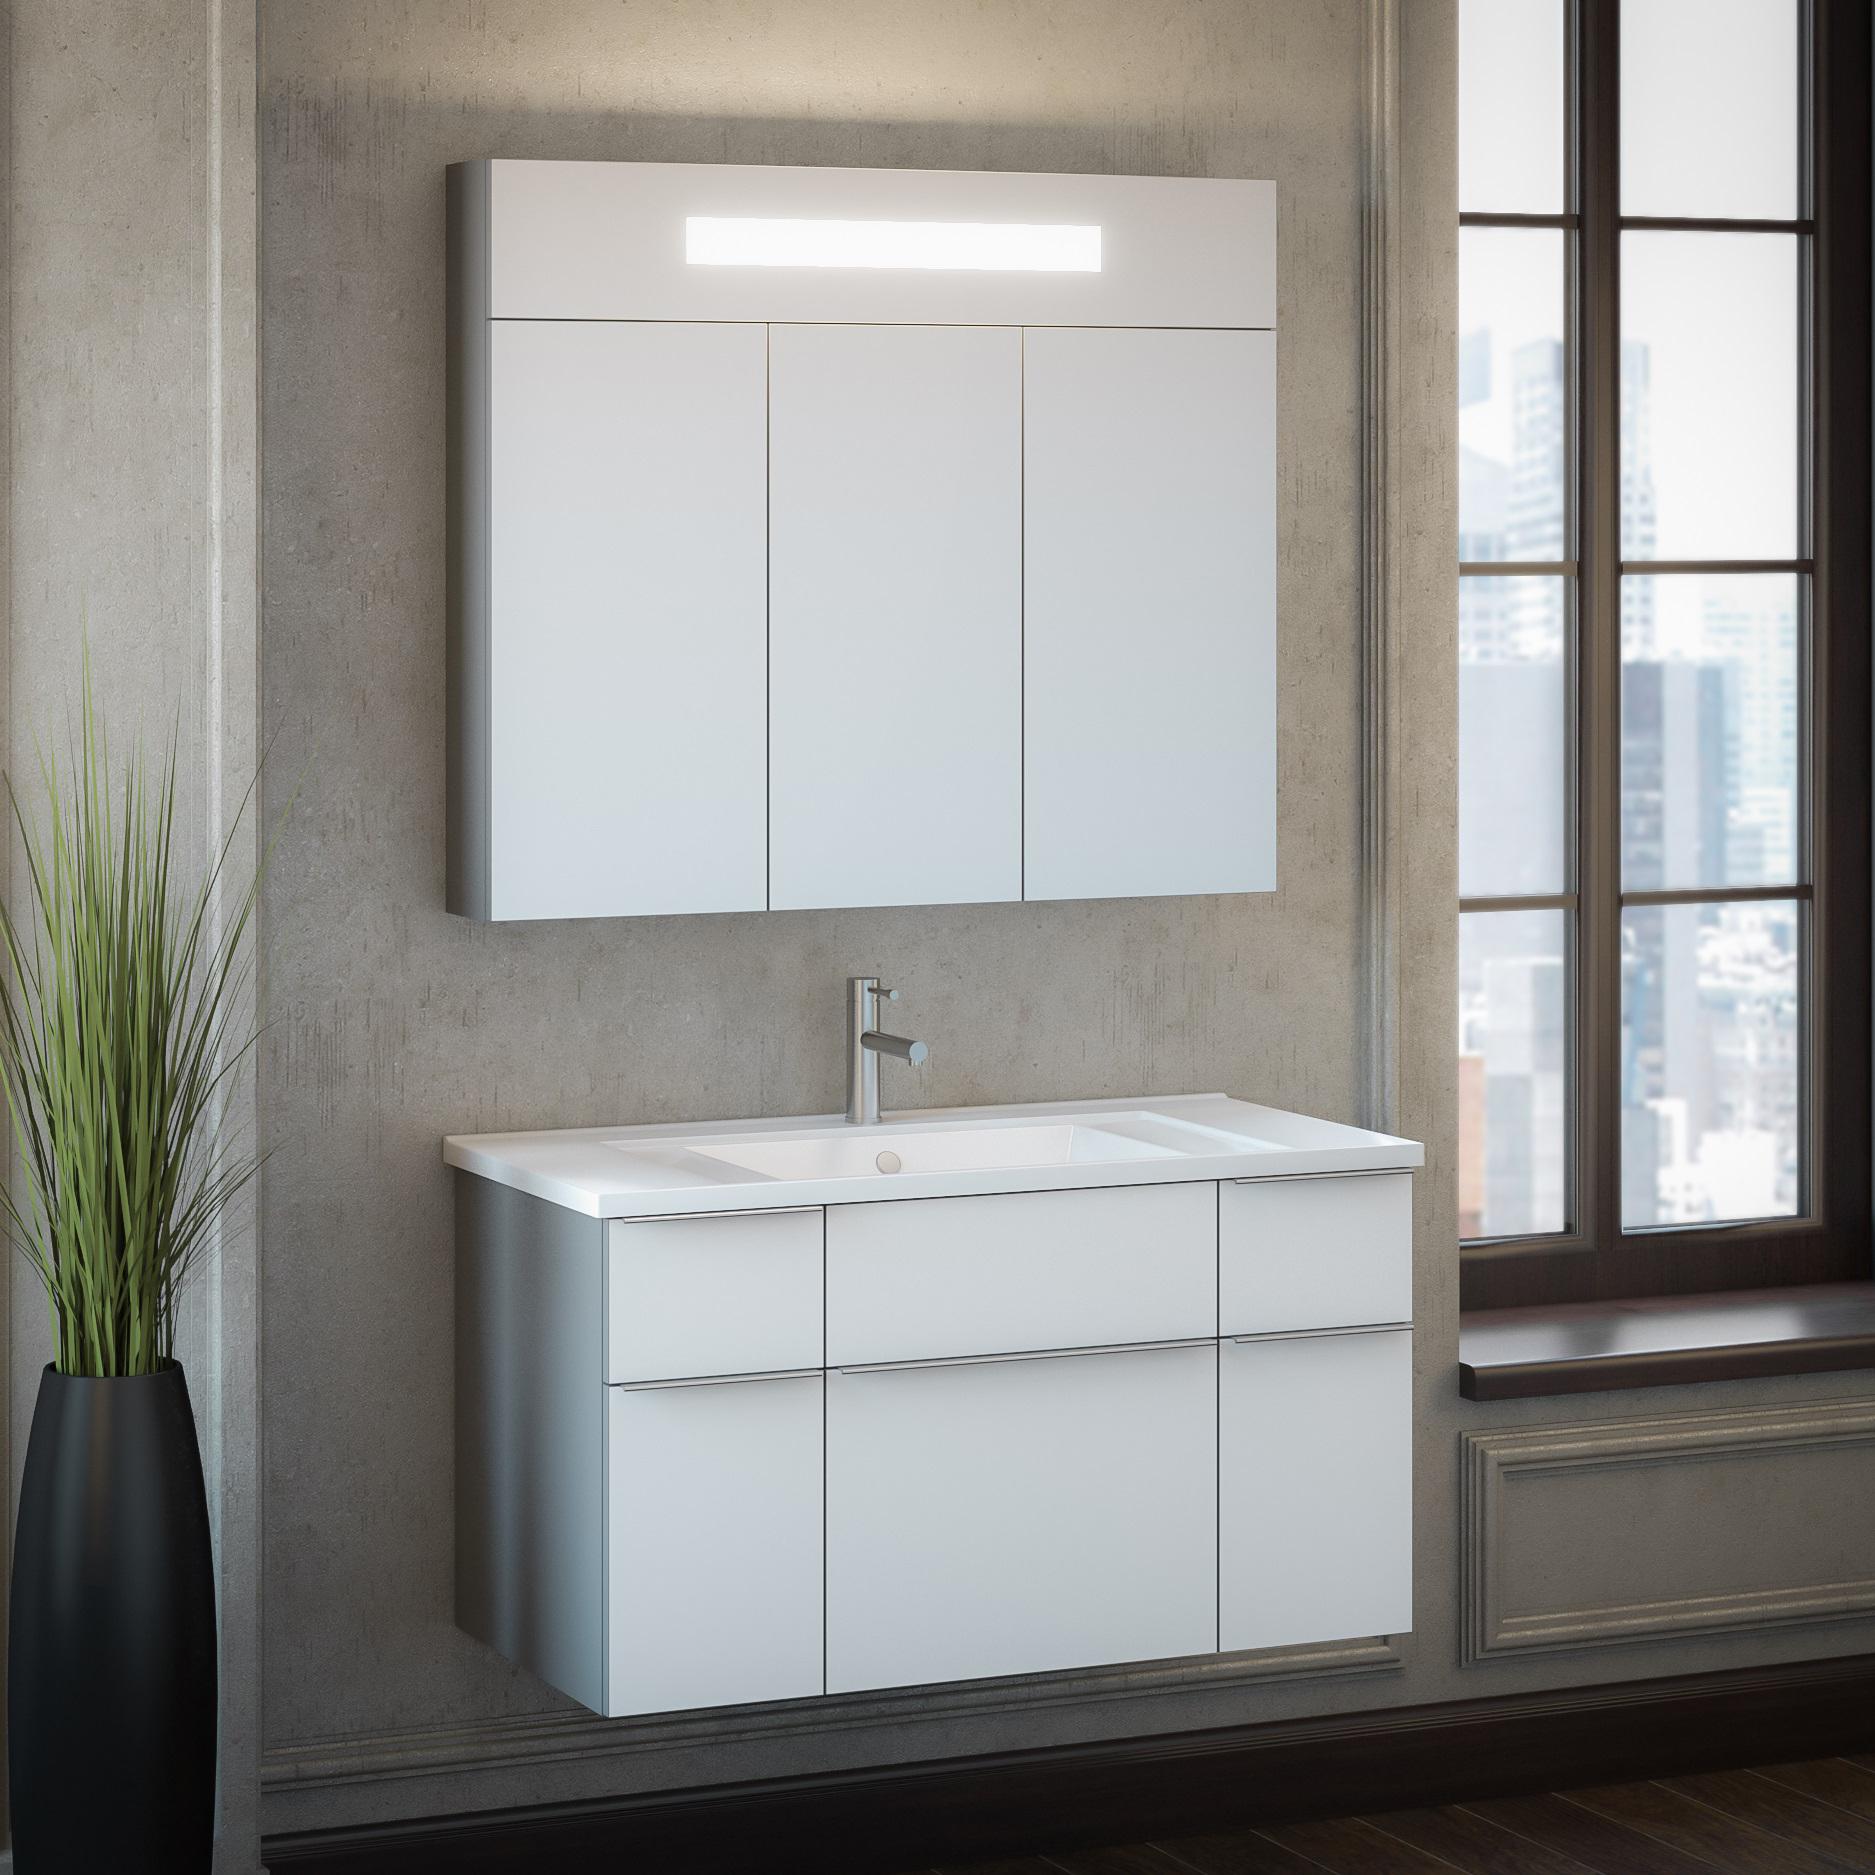 Комплект мебели Smile Кристалл 90 титан/черный